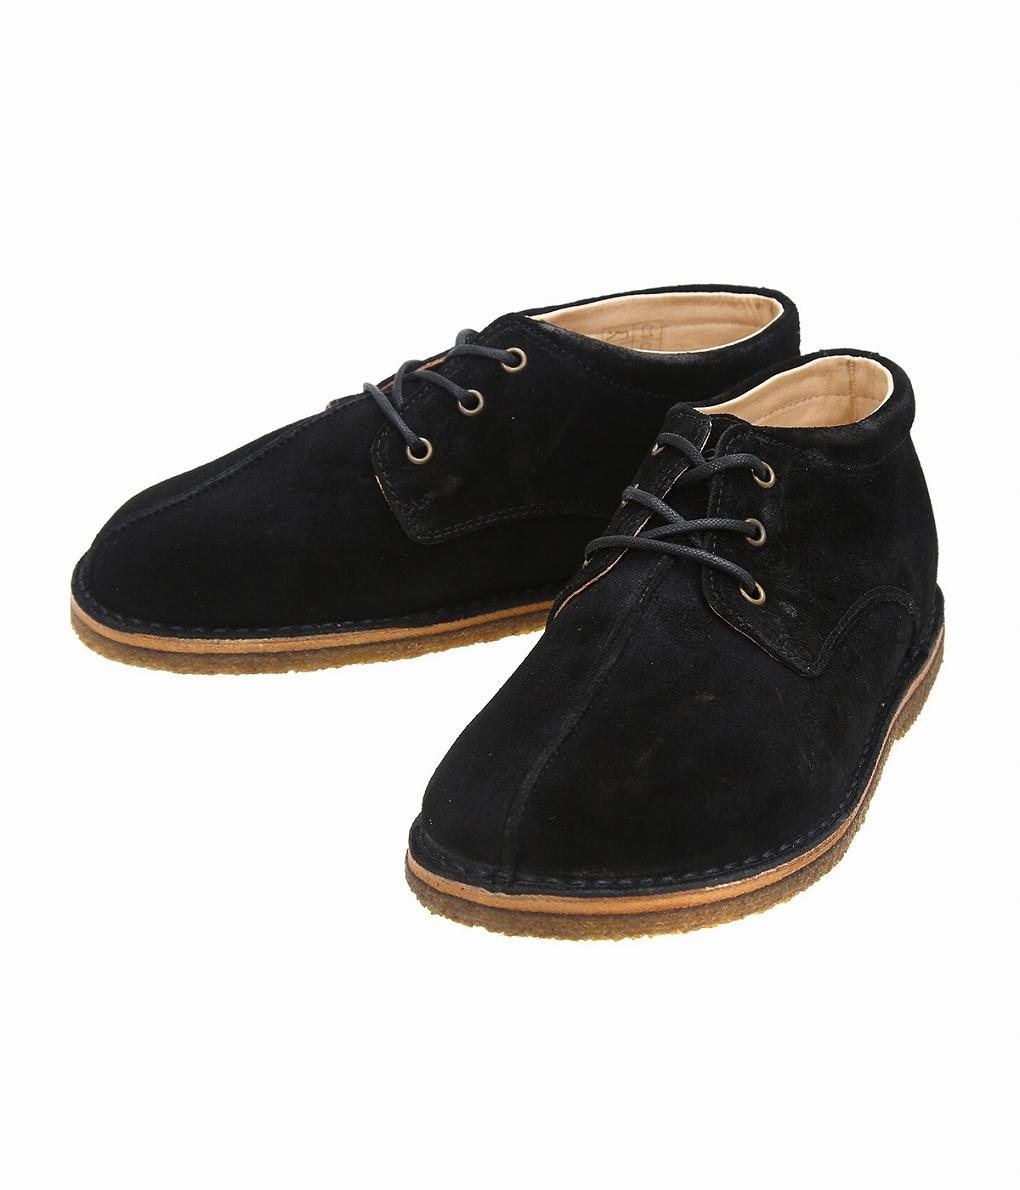 Astorflex / アストールフレックス : Countryflex -Nero- : カントリーフレックス 靴 シューズ 革靴 メンズ : Country-flex 【MUS】